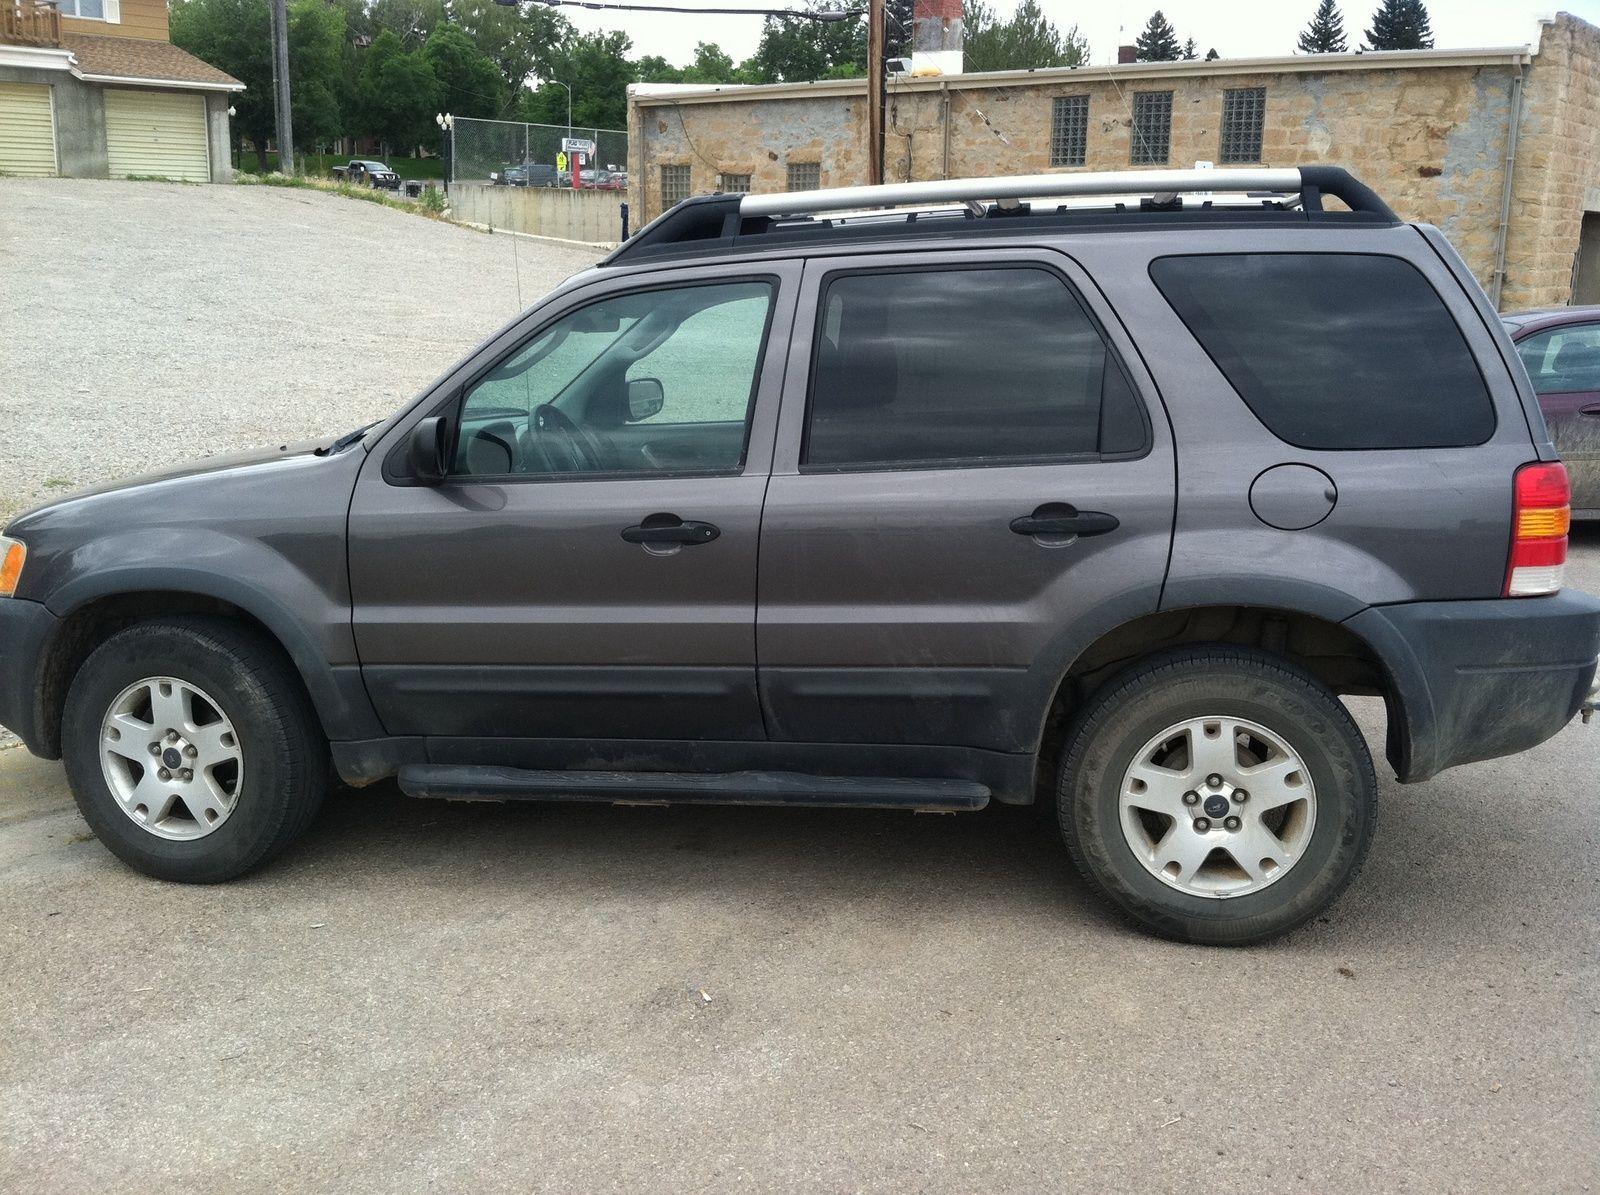 Ford escape compact sports utiltity suv vehicle